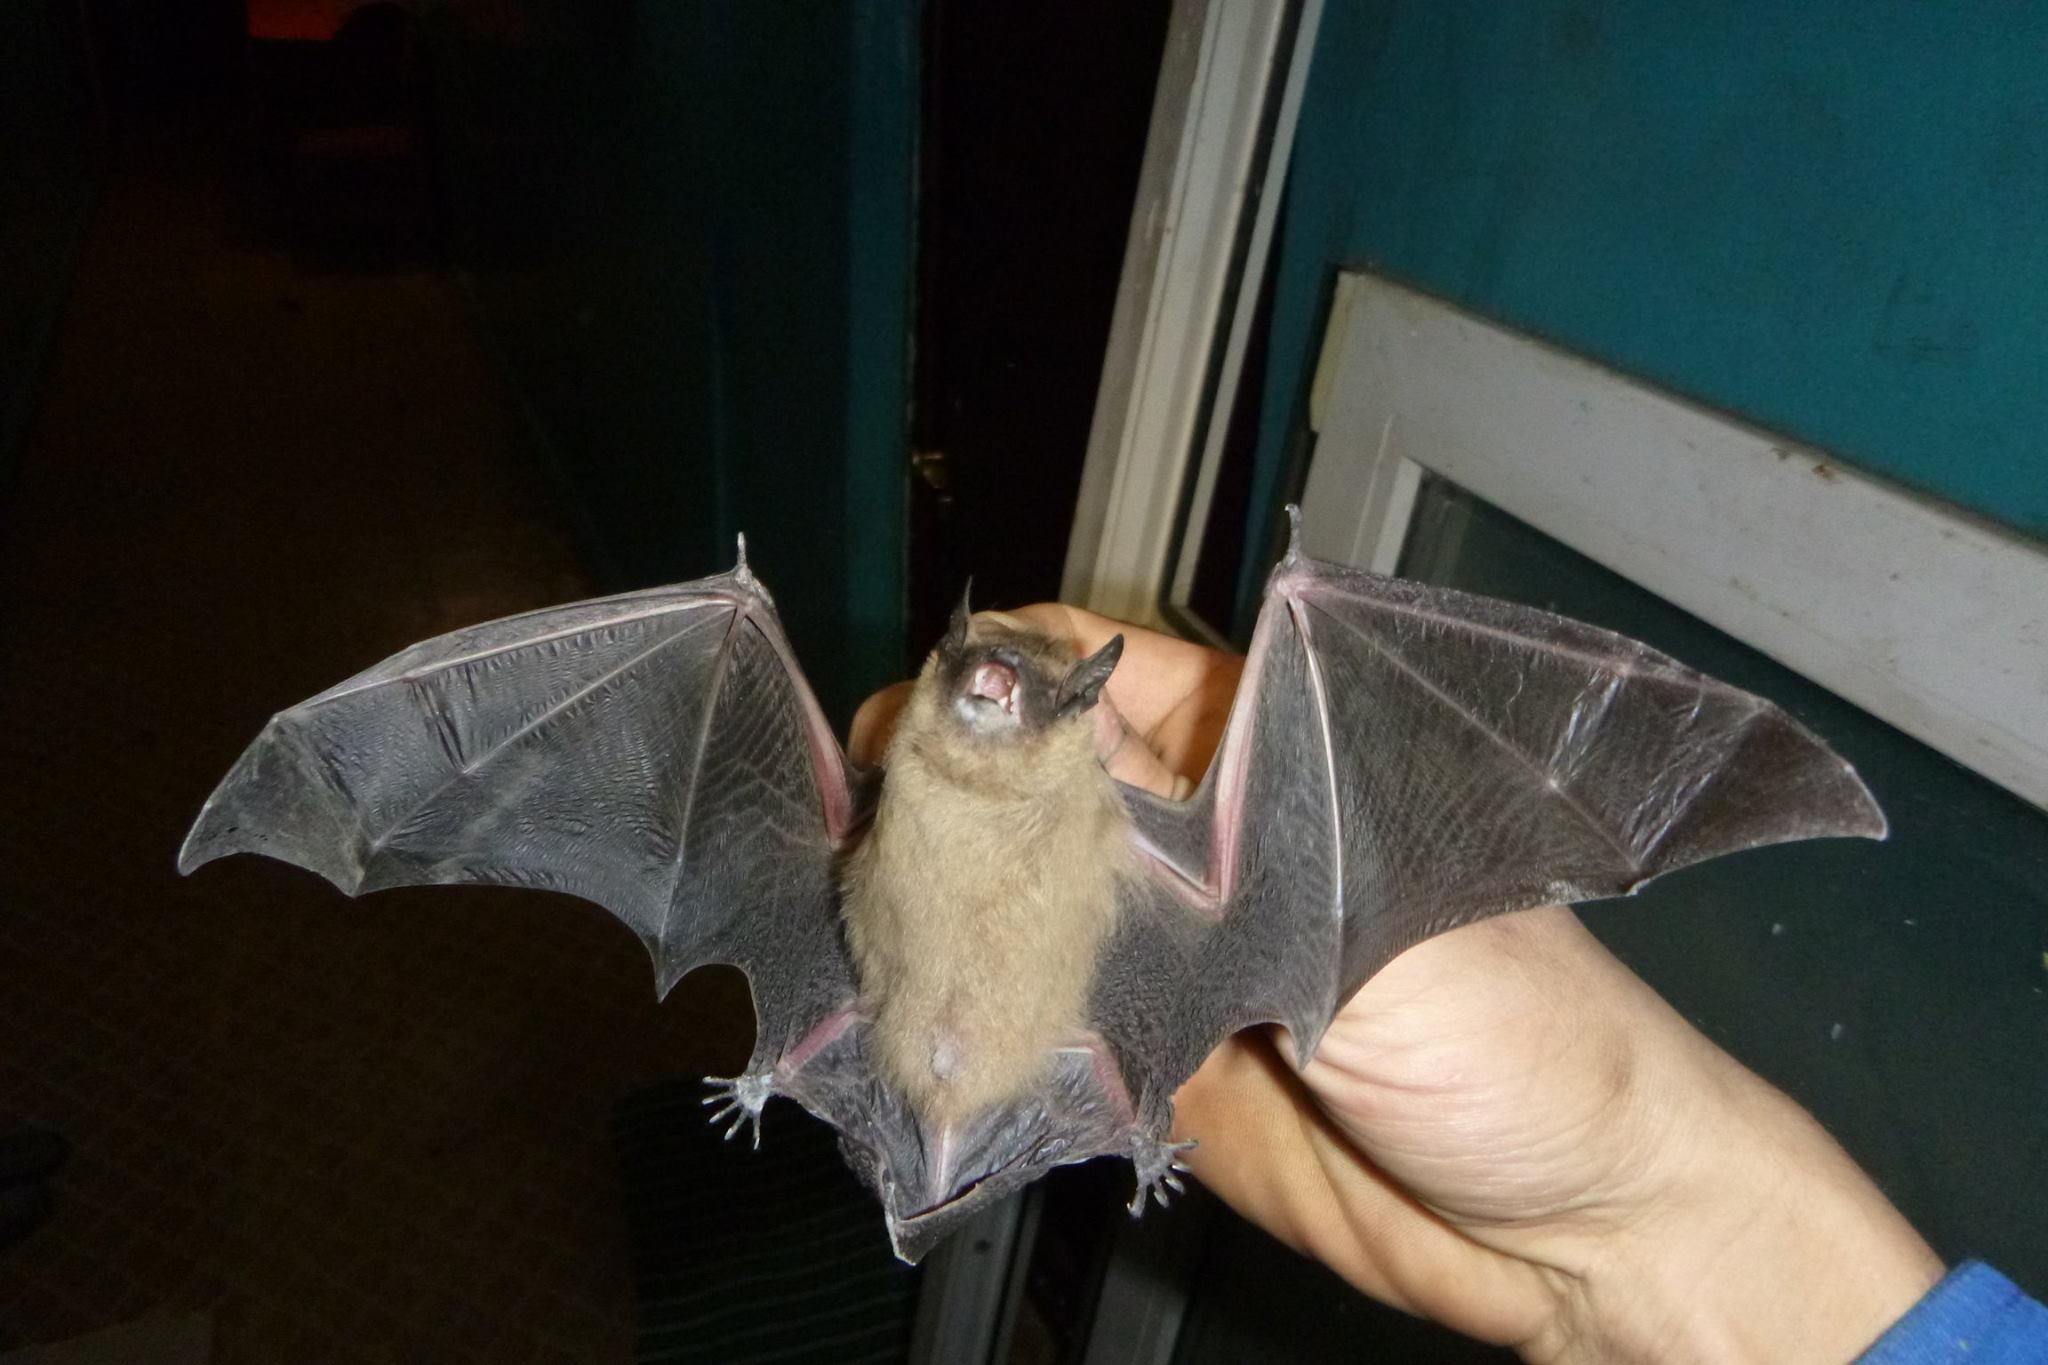 летучая мышь в руке